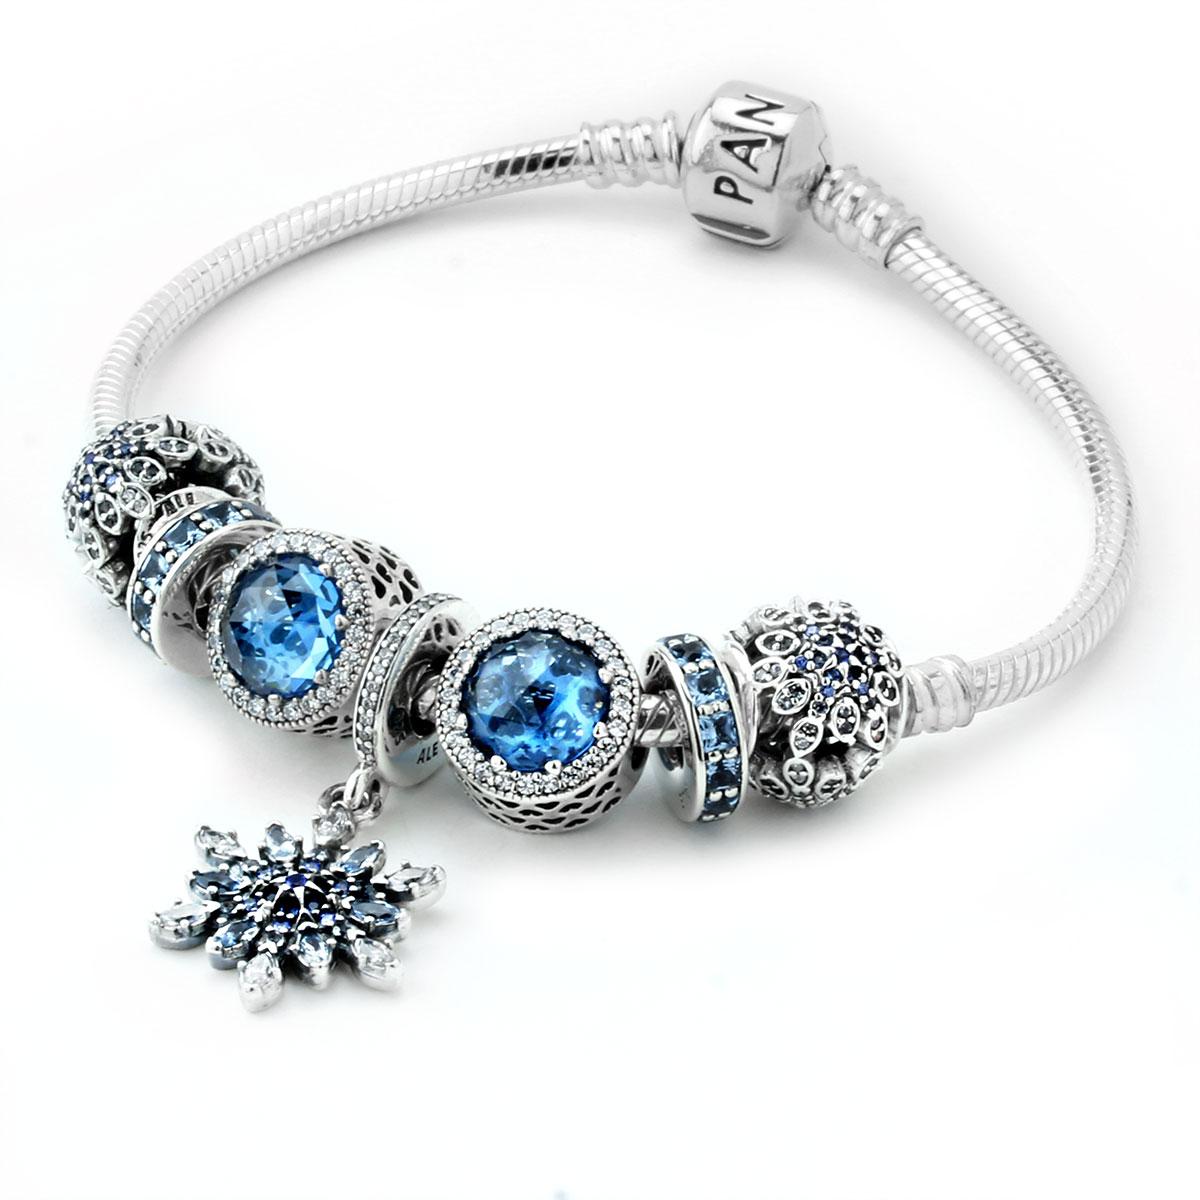 Pandora Bracelet Design Ideas authentic pandora sterling silver 925 ale bracelet with european beads and charms winter white f1 on Pandora Designer Bracelets Elisa Ilana